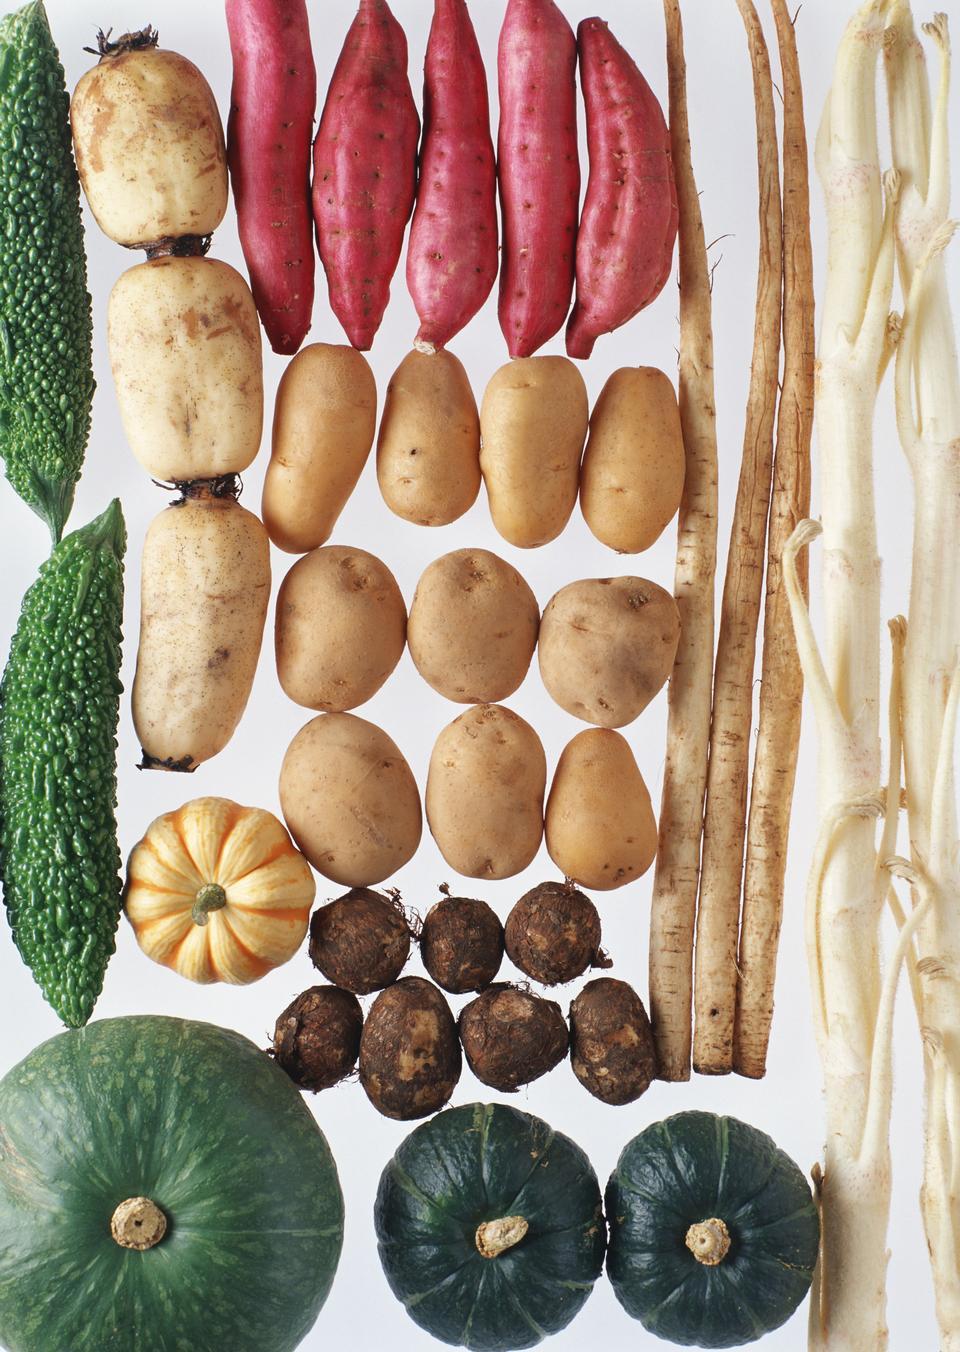 Autumn border of vegetables